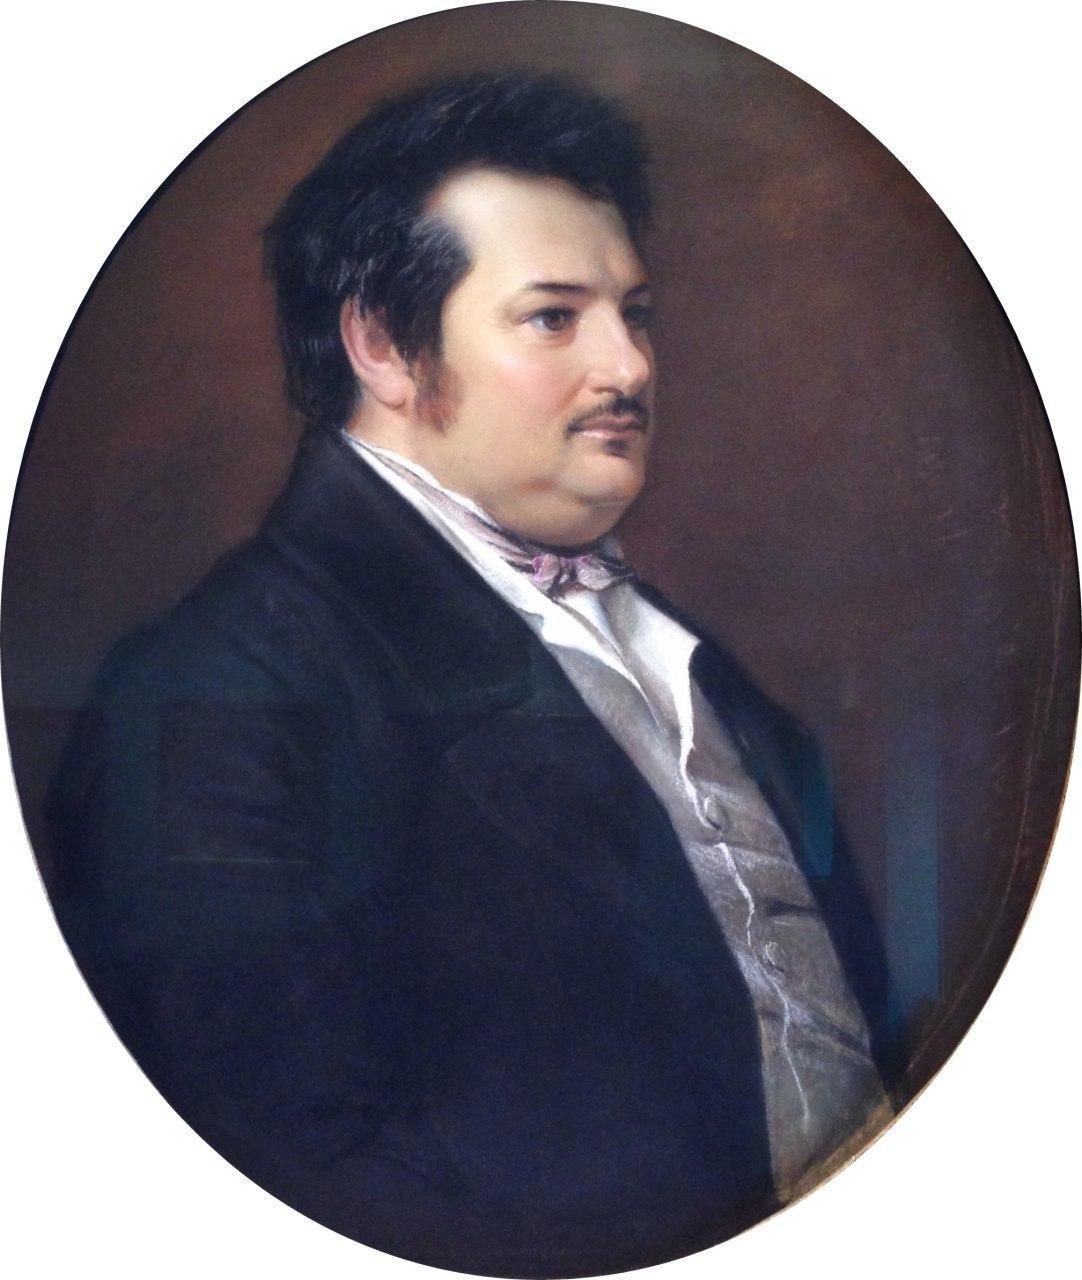 18 августа 1850 года умер Оноре де Бальзак